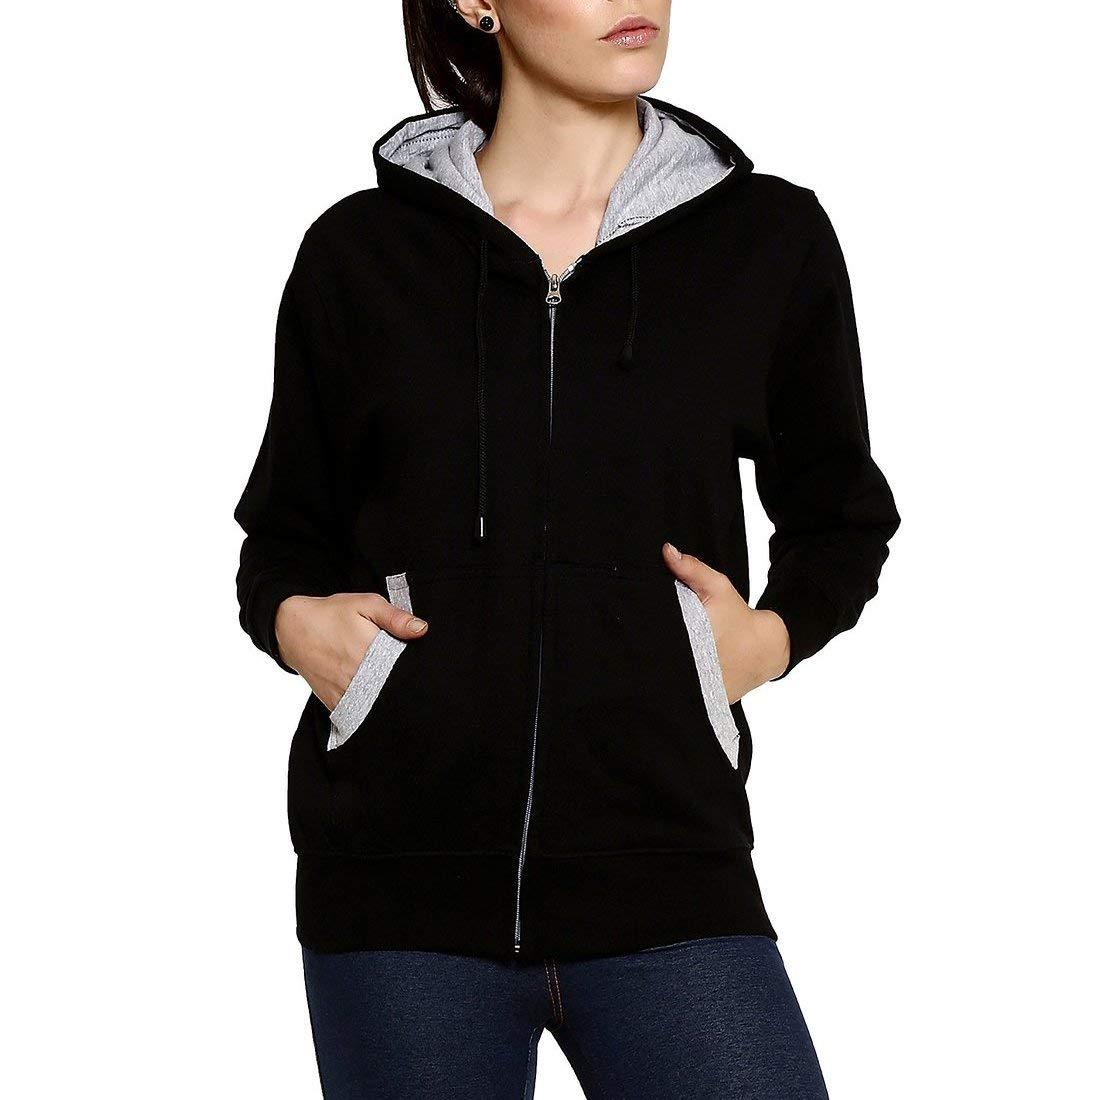 Goodtry G Women's Cotton Hoodies-Black